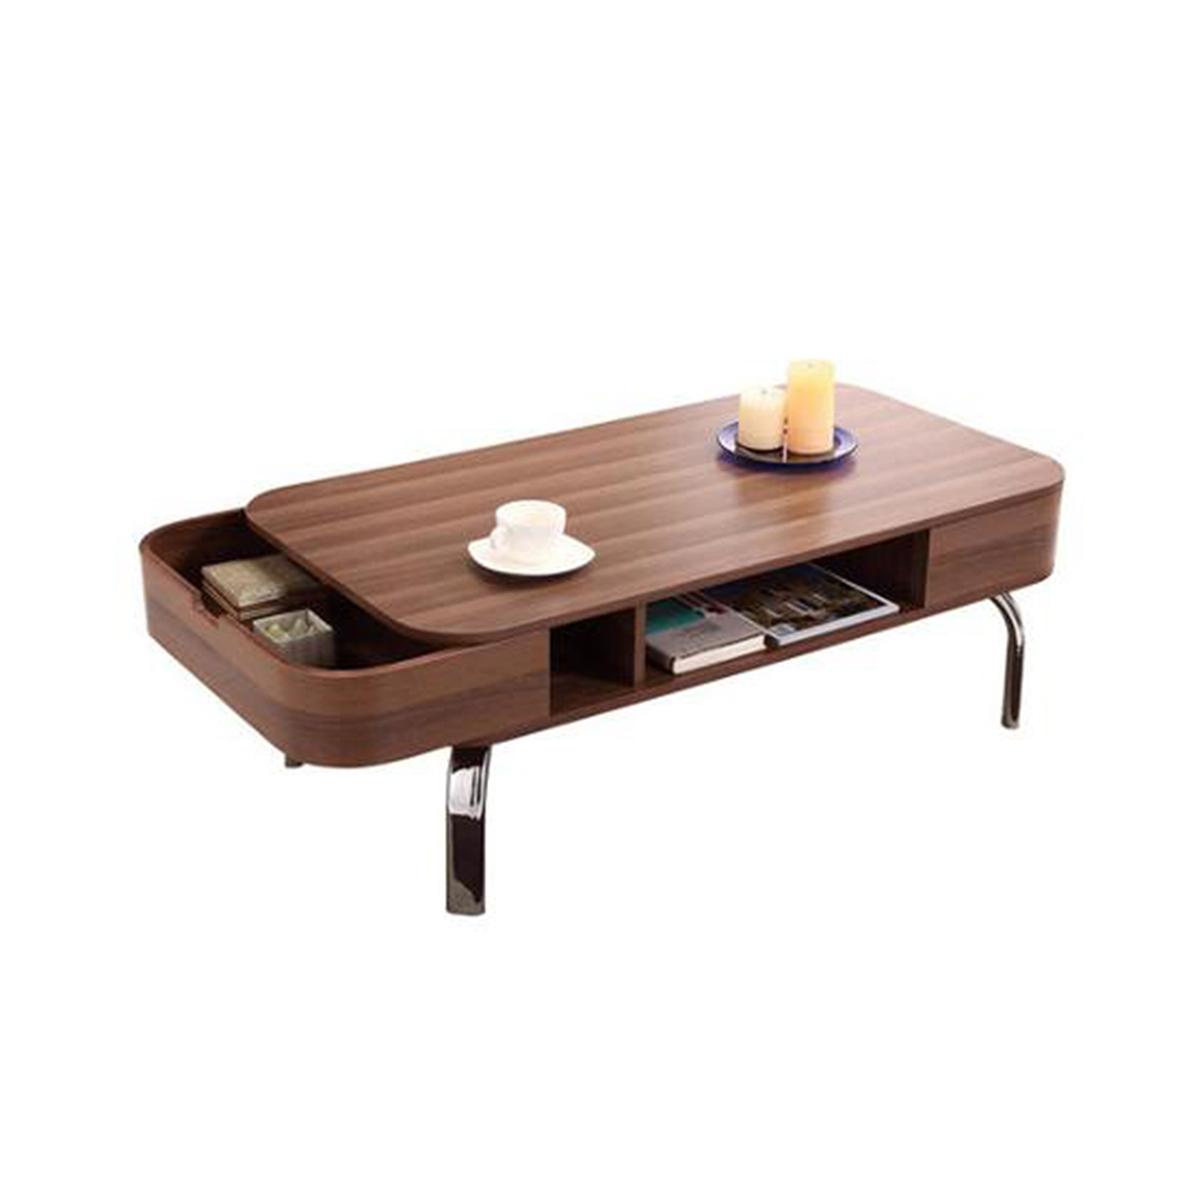 Mesa de centro de grano de madera realista | Fabricantes de muebles ...